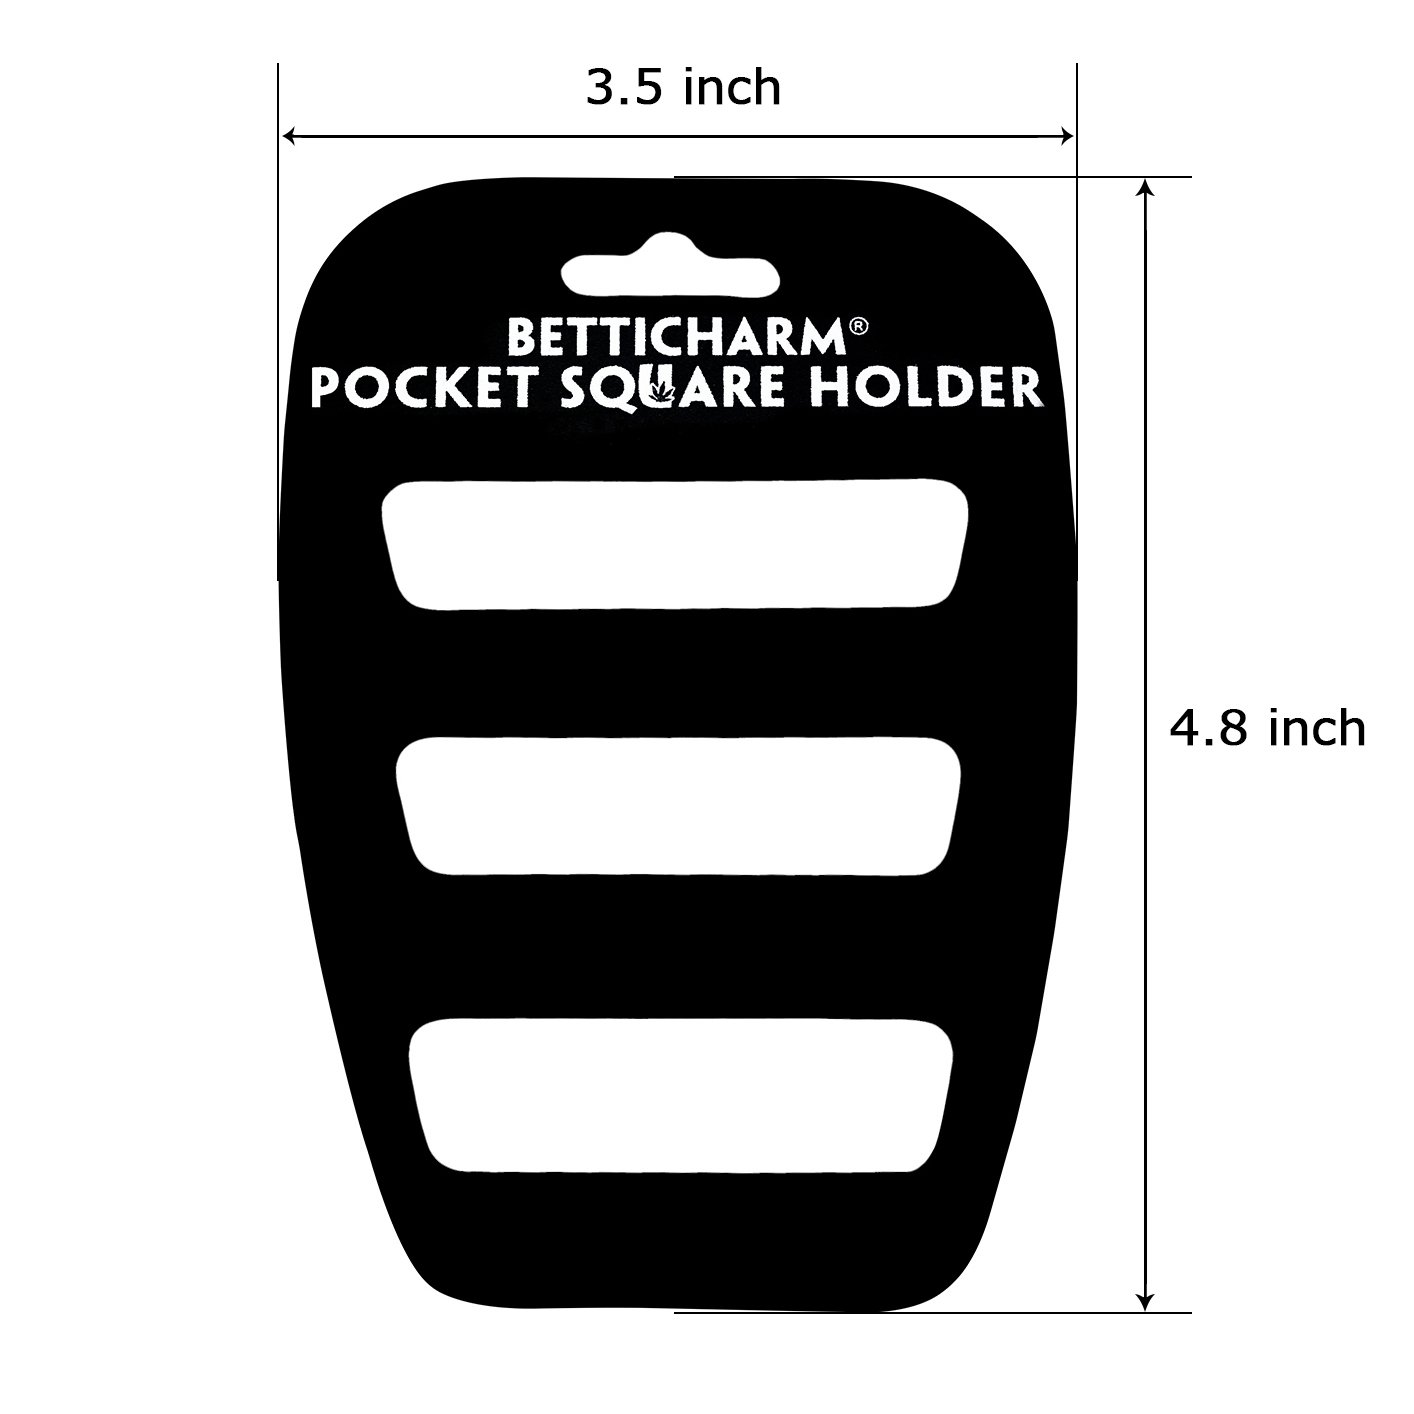 BettiCharm Slim Pocket Square Holders, Men's Suit Handkerchiefs Keeper/Organizer (5 Pack) by BettiCharm (Image #2)